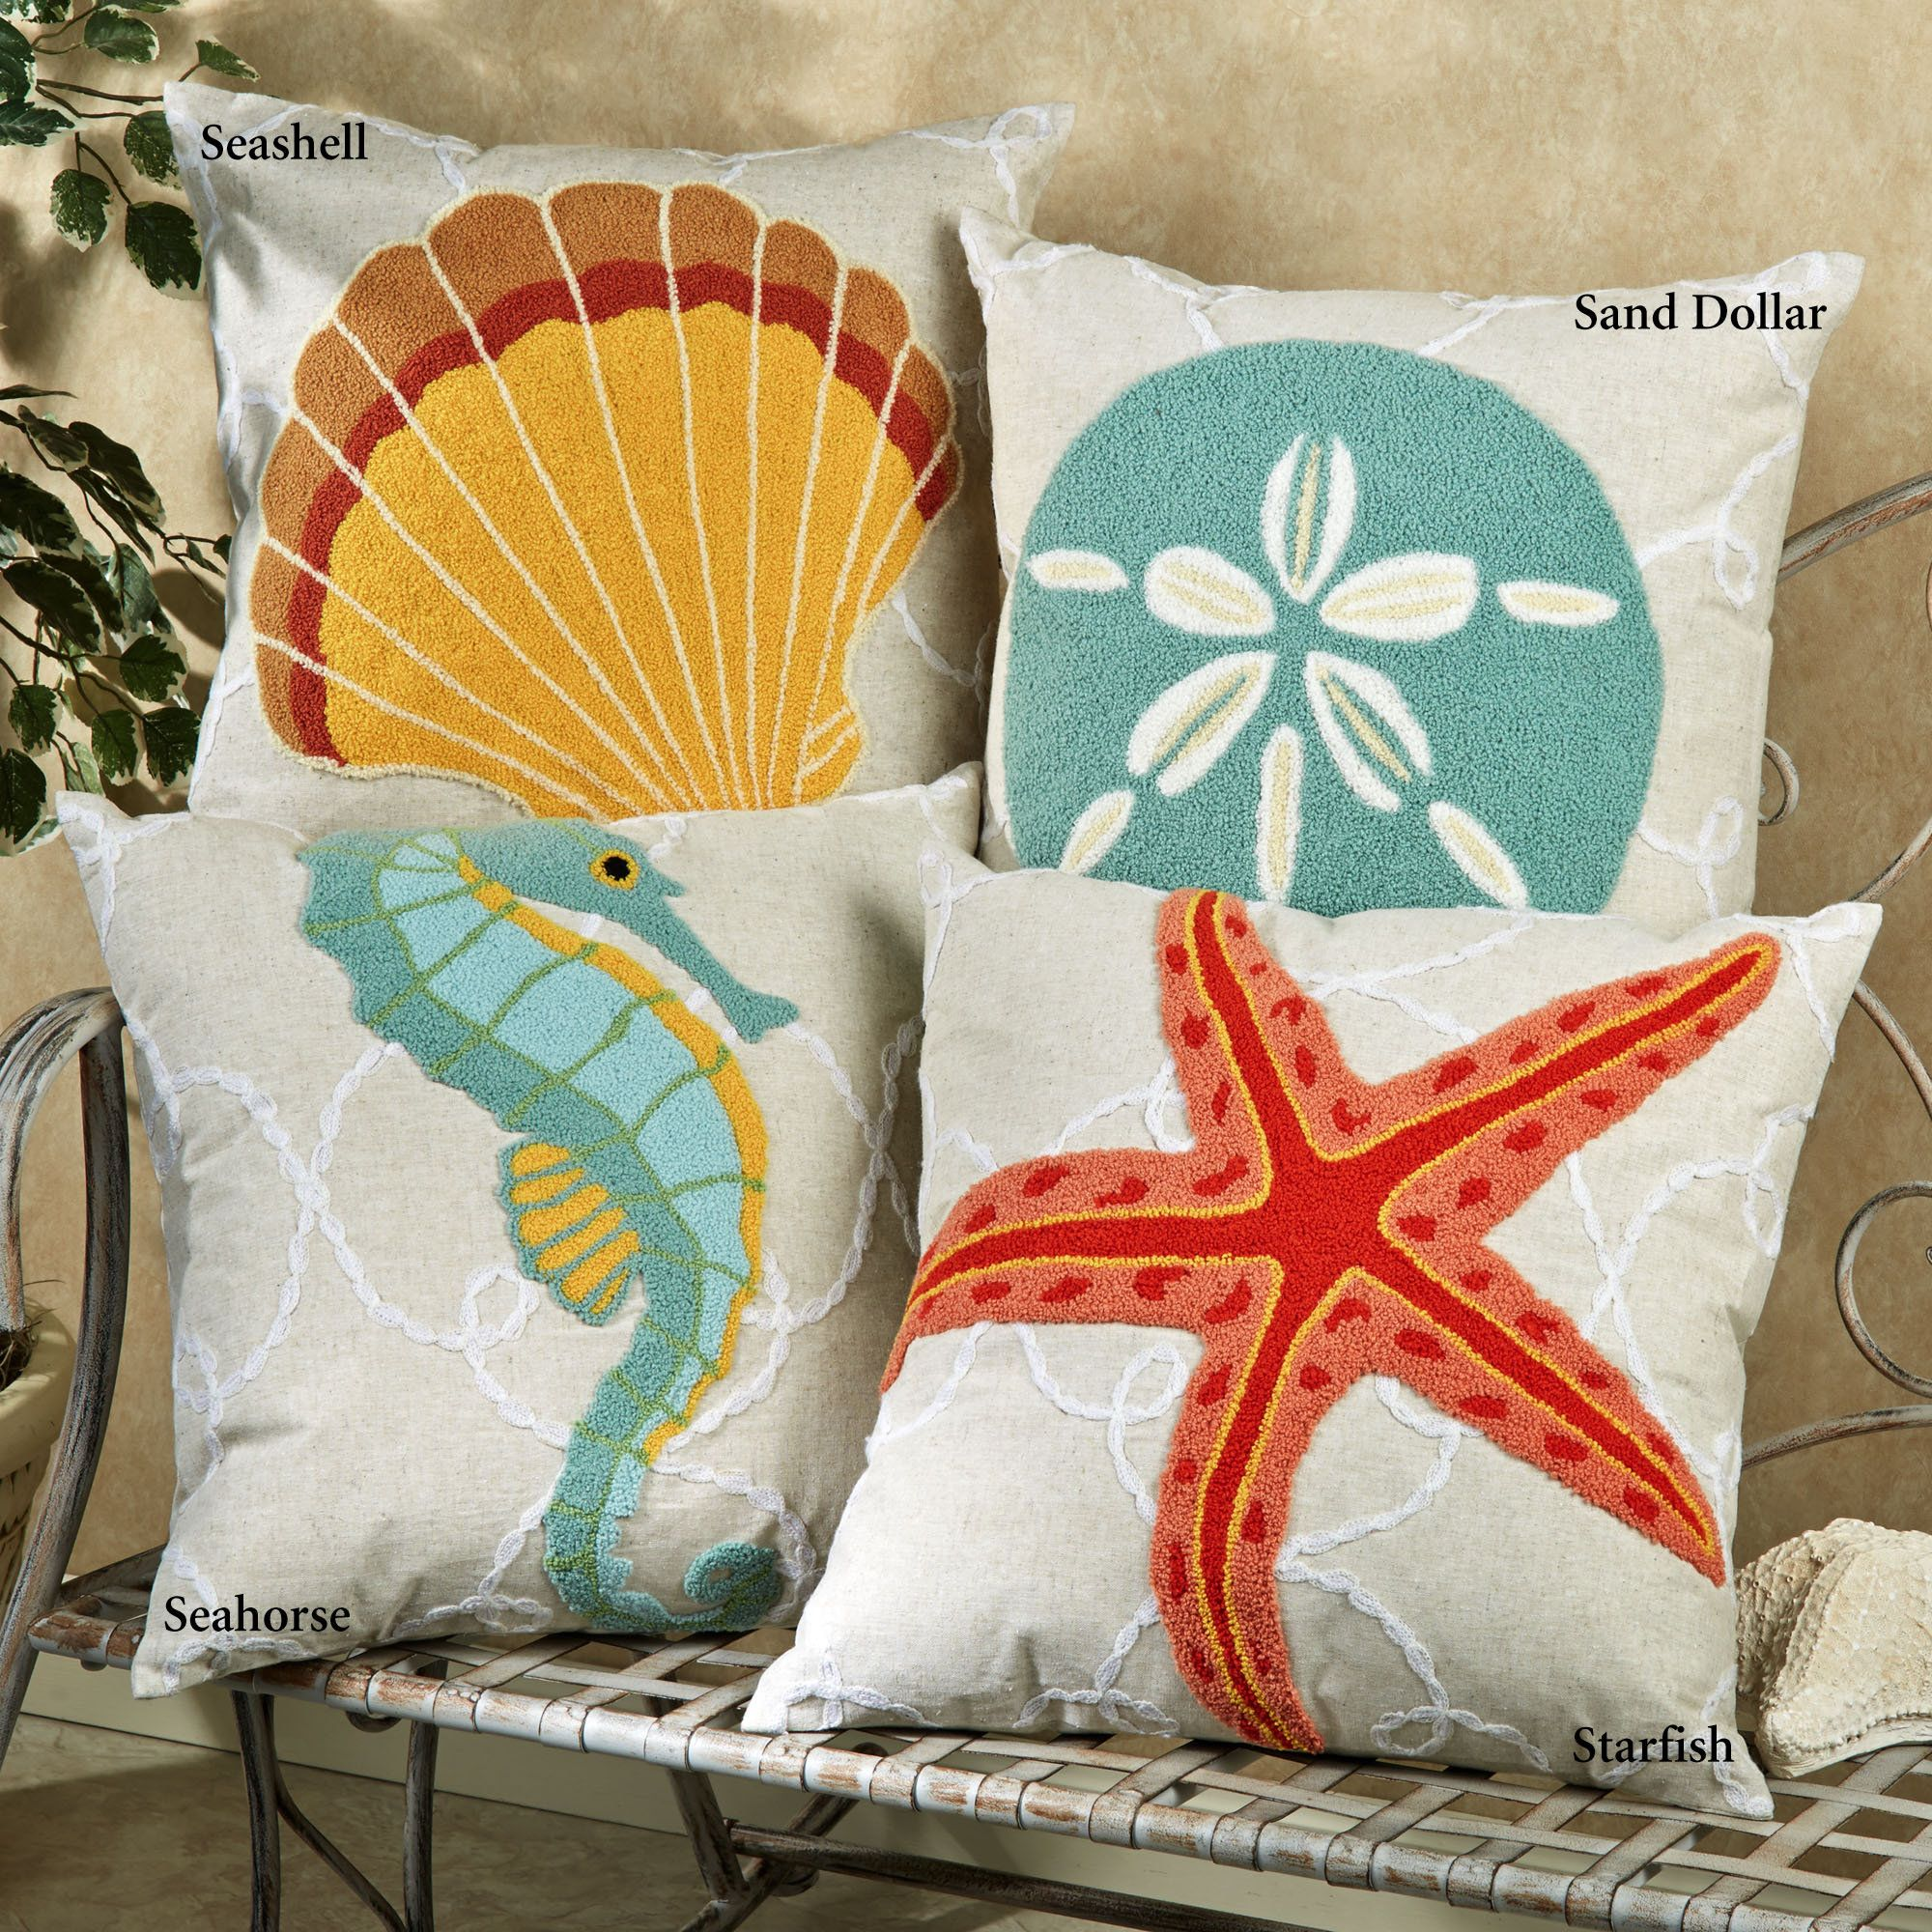 Washed Ashore Beach Themed Decorative Pillows Beach House Decor